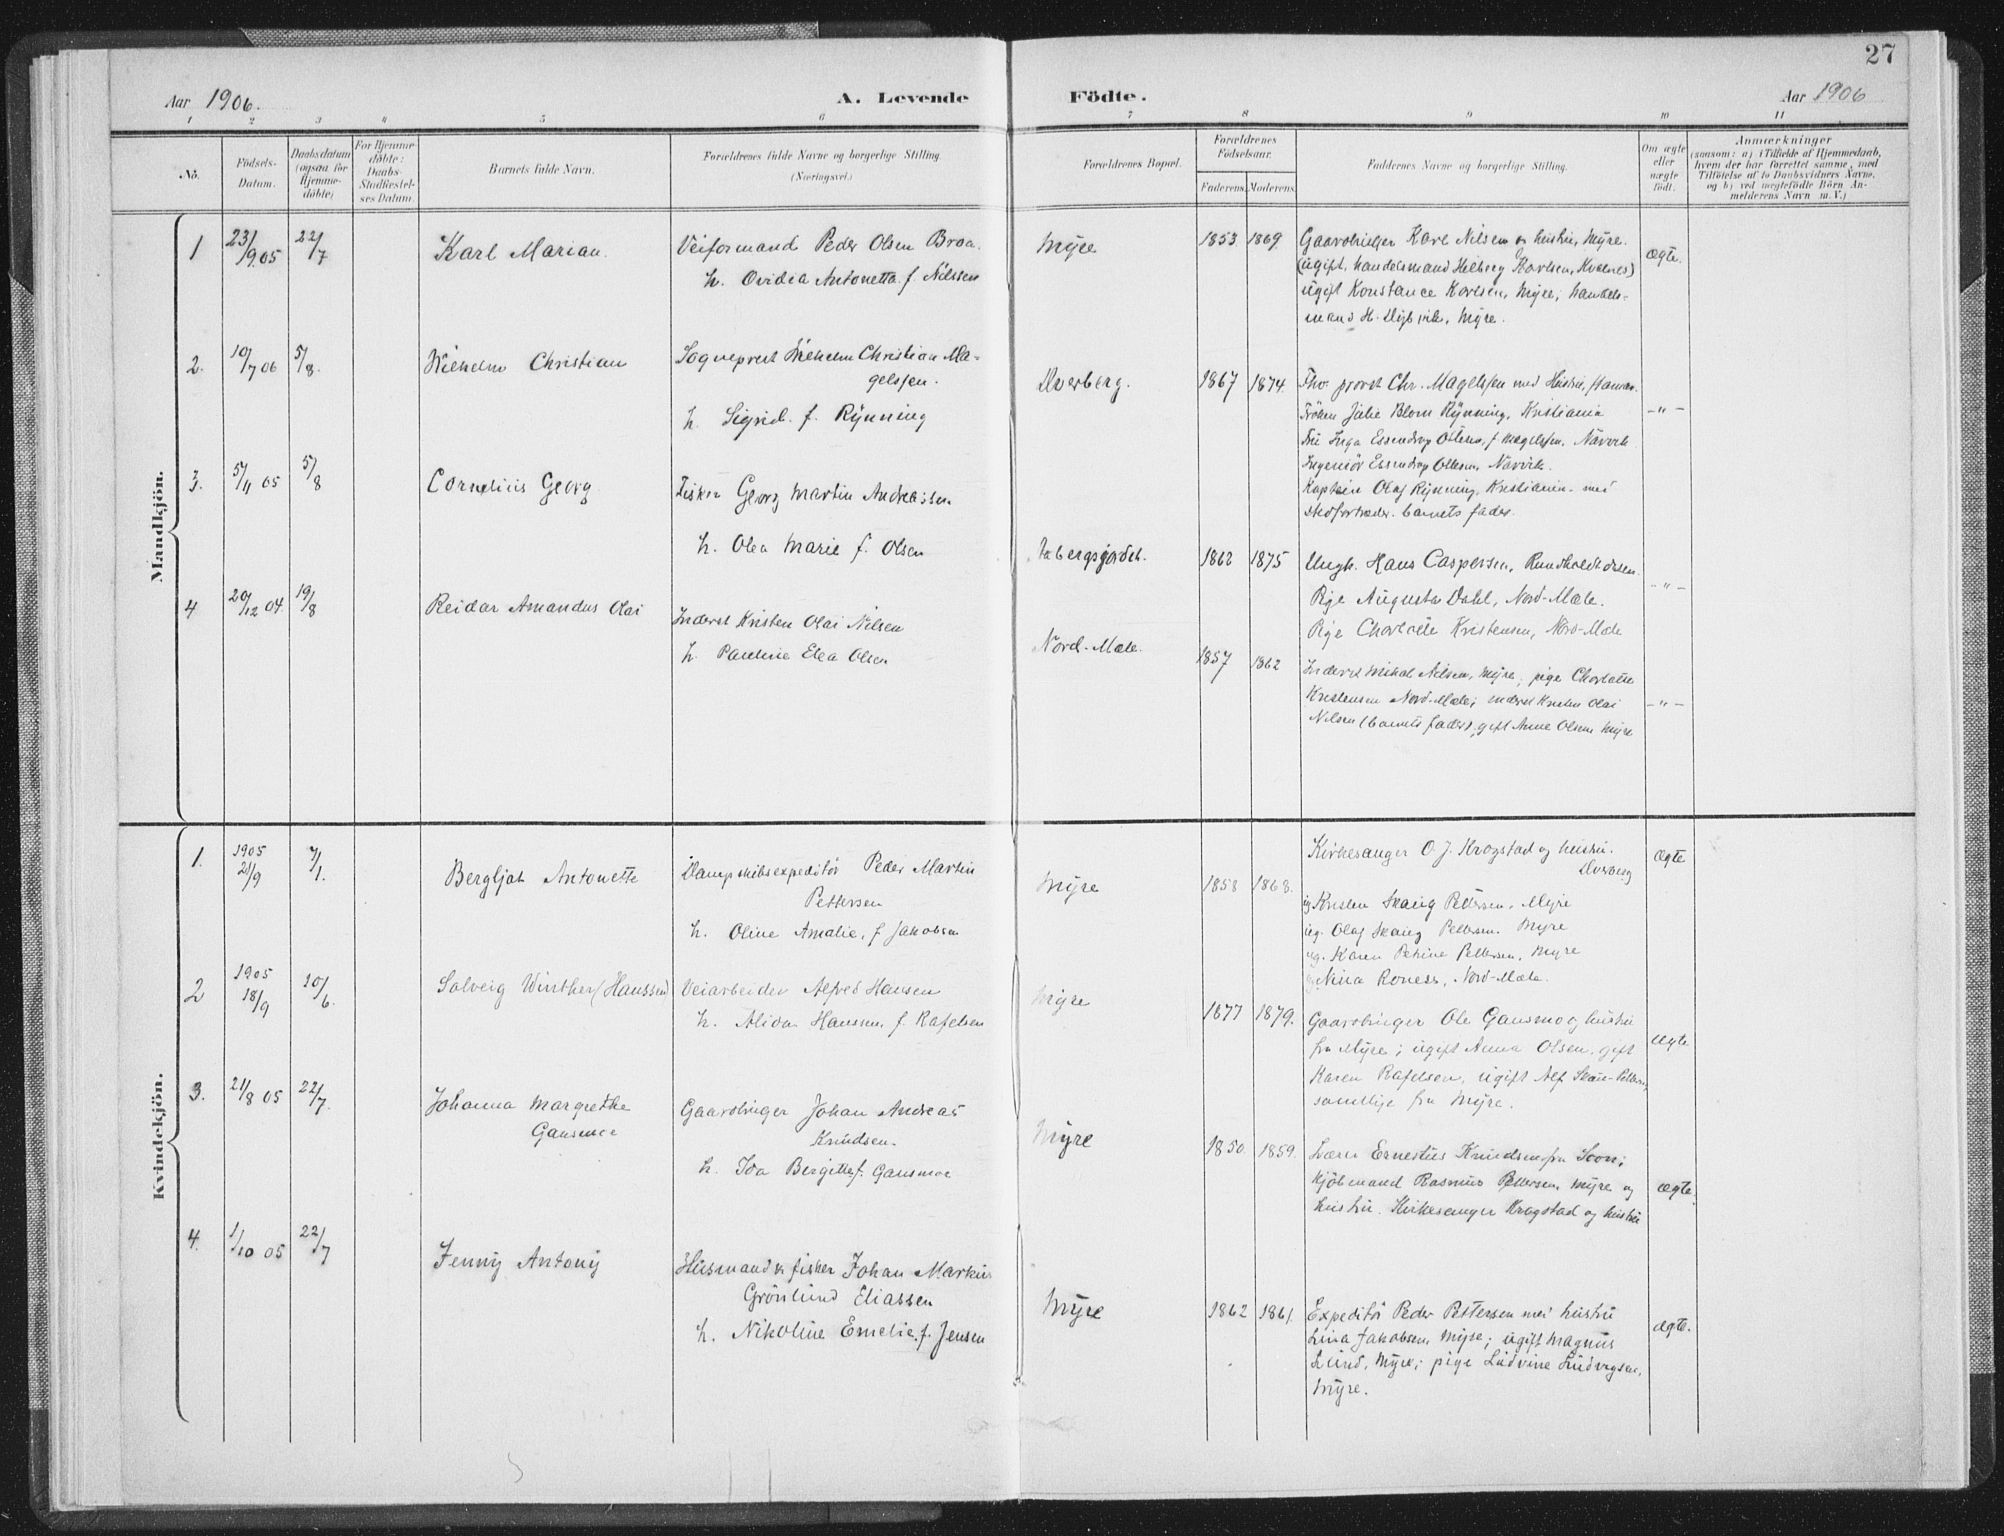 SAT, Ministerialprotokoller, klokkerbøker og fødselsregistre - Nordland, 897/L1400: Ministerialbok nr. 897A07, 1897-1908, s. 27